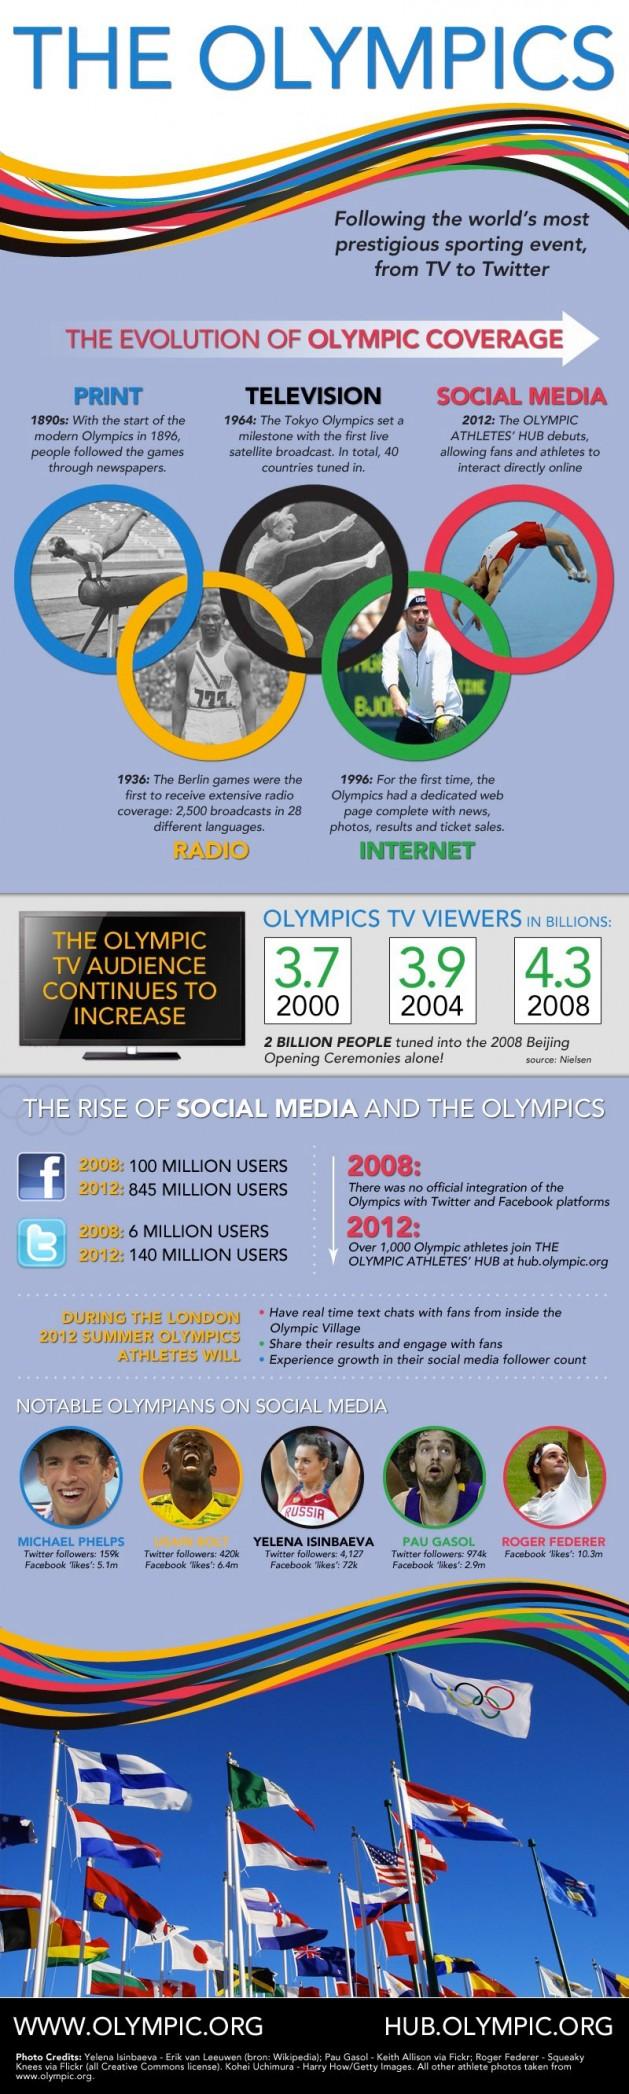 ioc-olympic-infographic-9